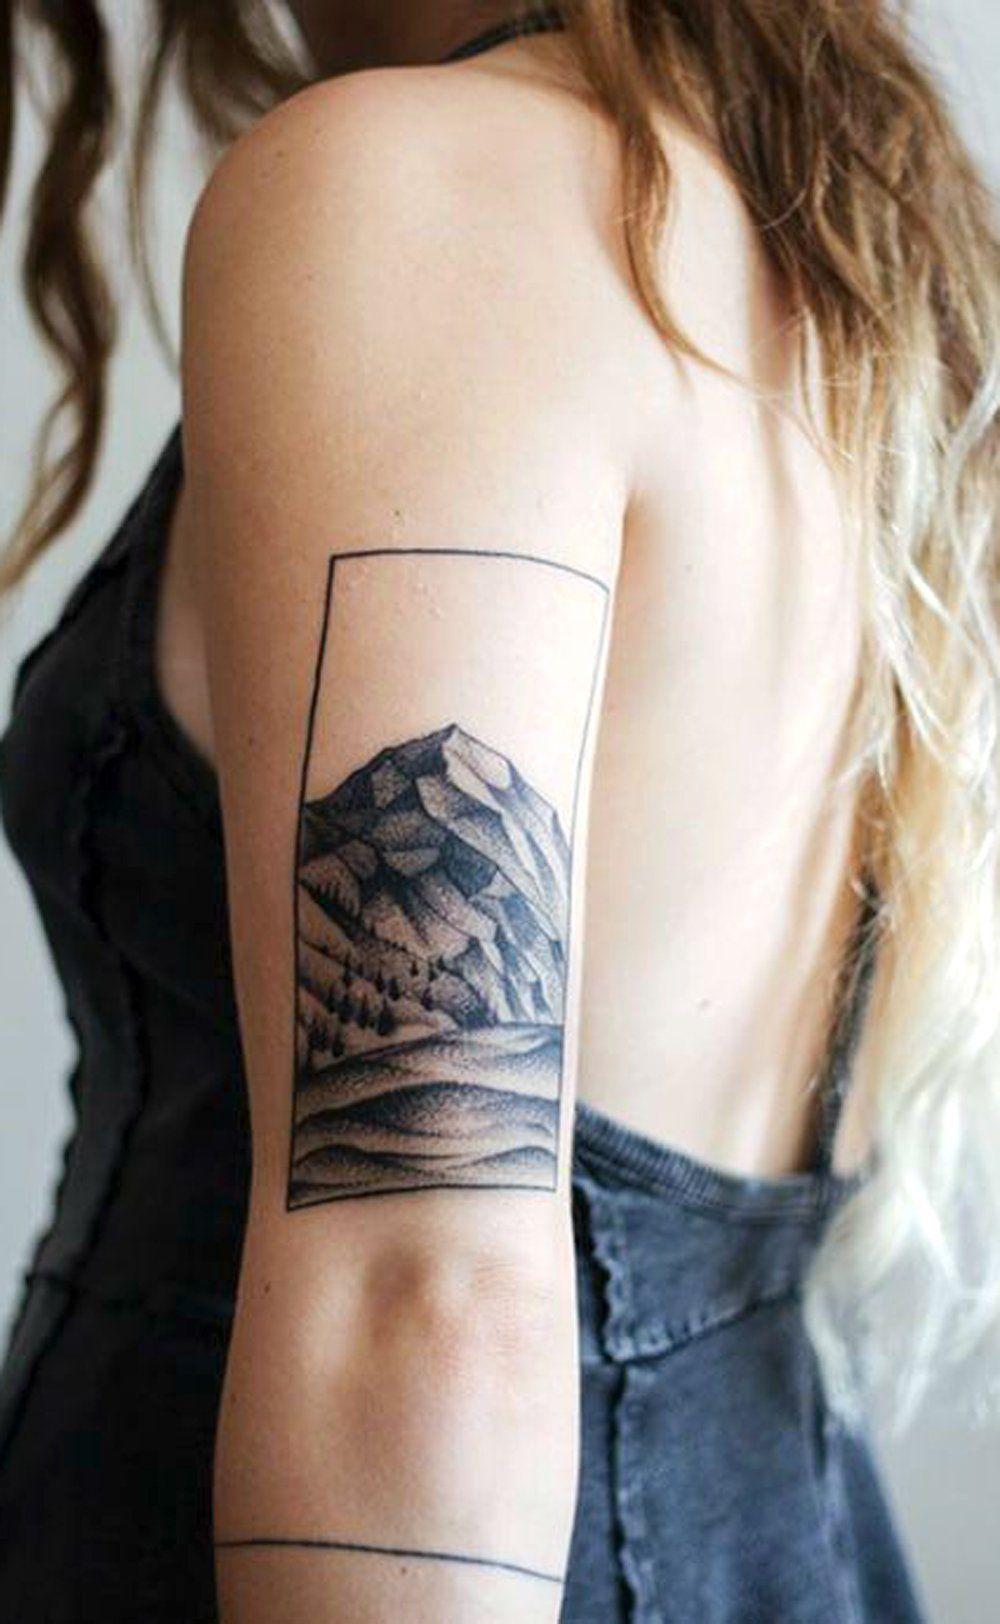 Black Geometric Mountain Back Of Arm Tattoo Ideas For Women Nature Forearm Tat Ideas De Tatuajes De Brazo De Tatuajes Al Azar Tatuajes Tatuajes De Puntos